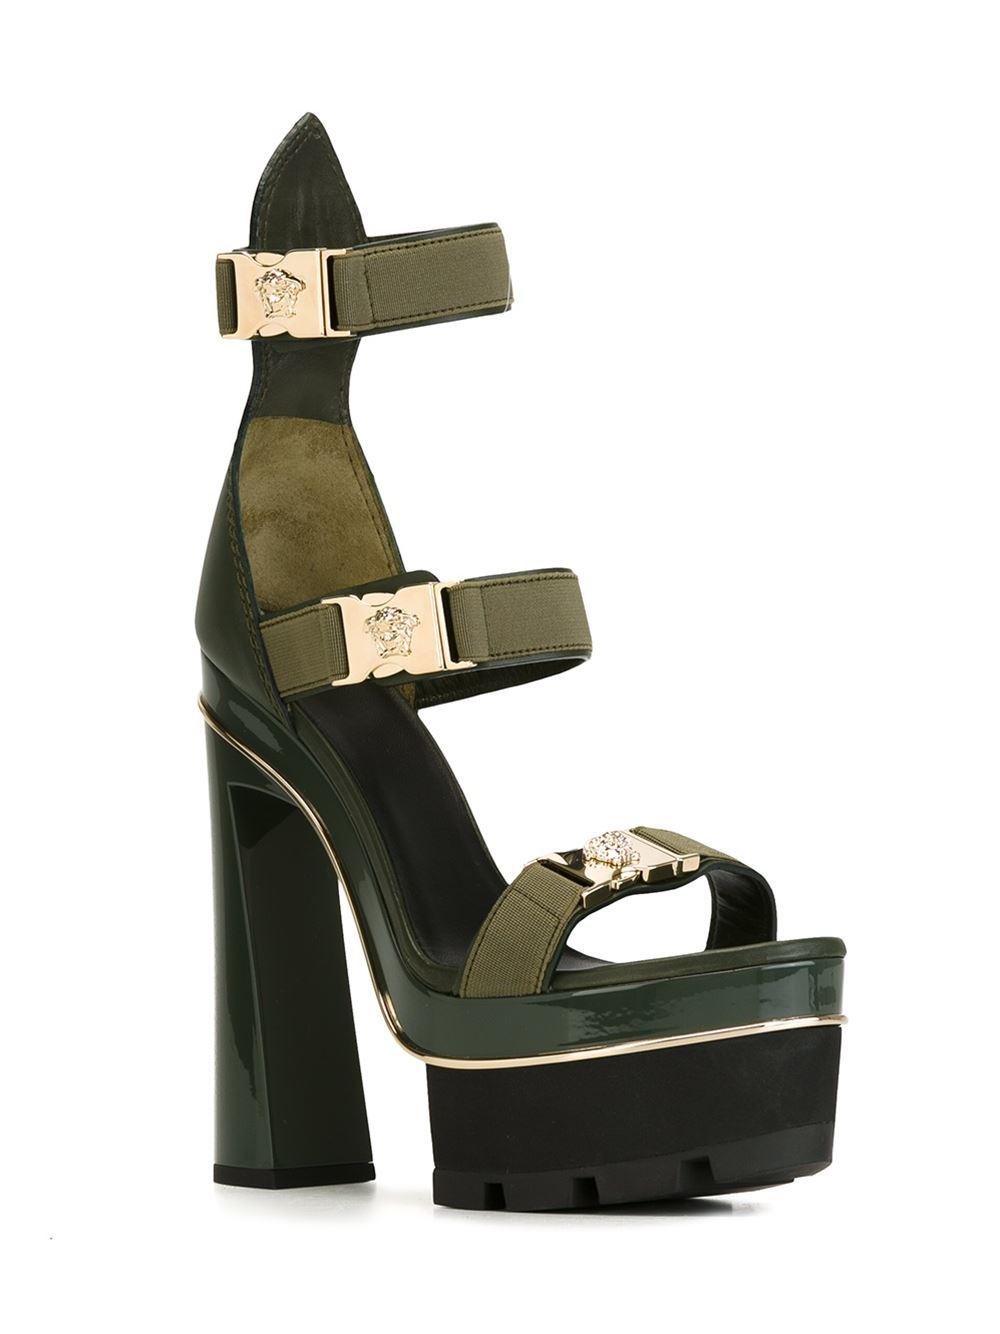 b046f660d5e Versace Medusa Tri-strap Platform Sandals - Stefania Mode - Farfetch ...